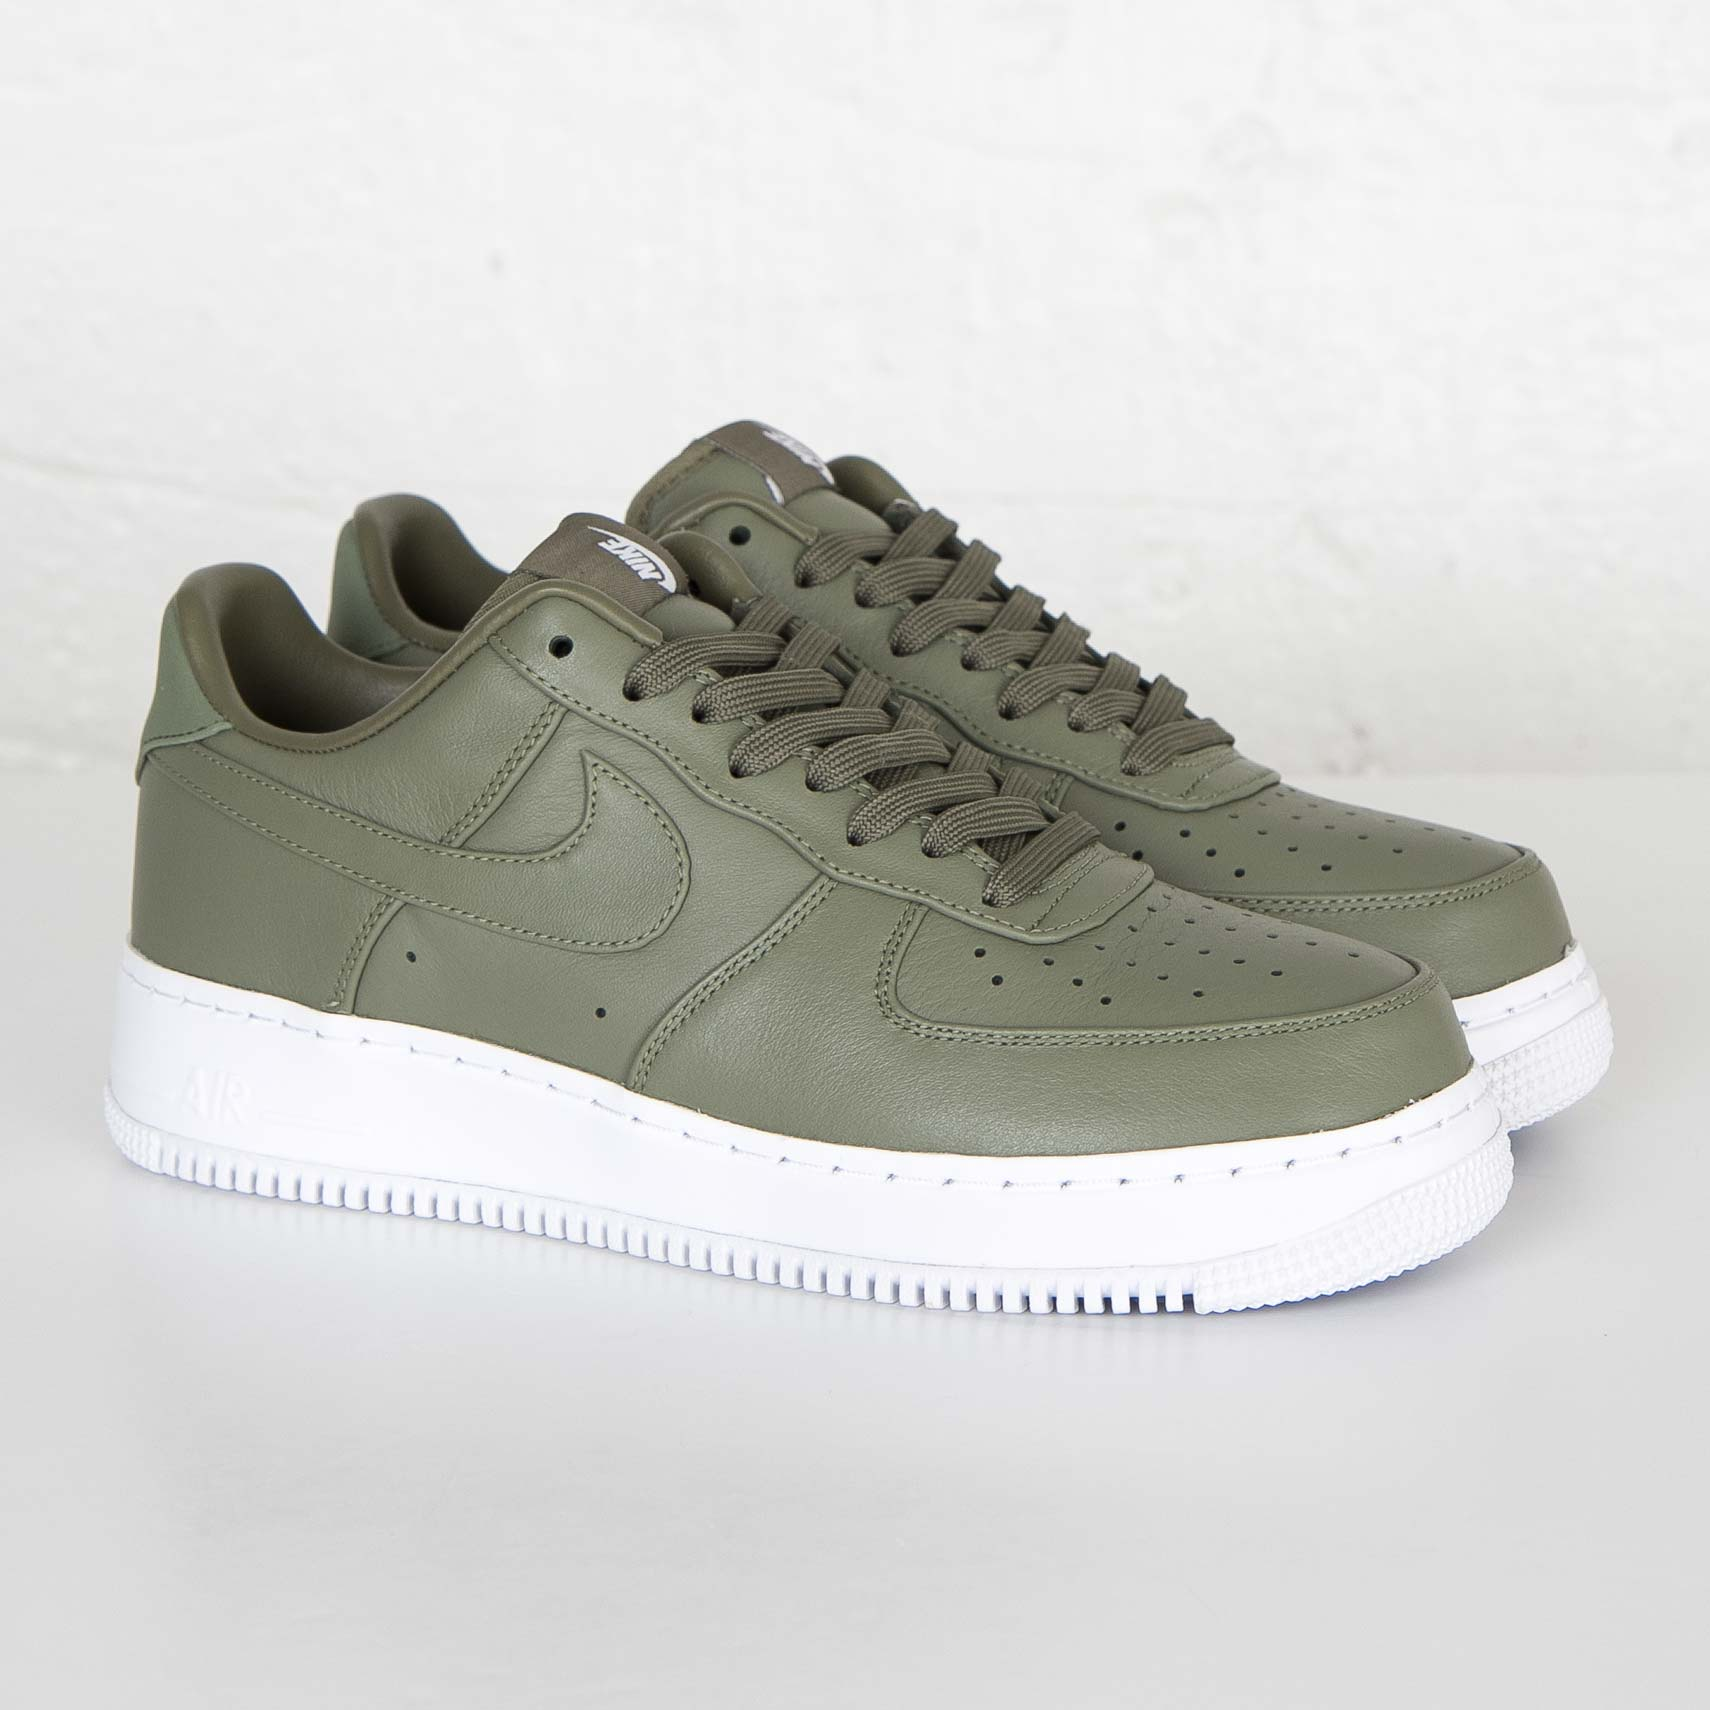 sale retailer fcada 2fe66 Nike NikeLab Air Force 1 Low